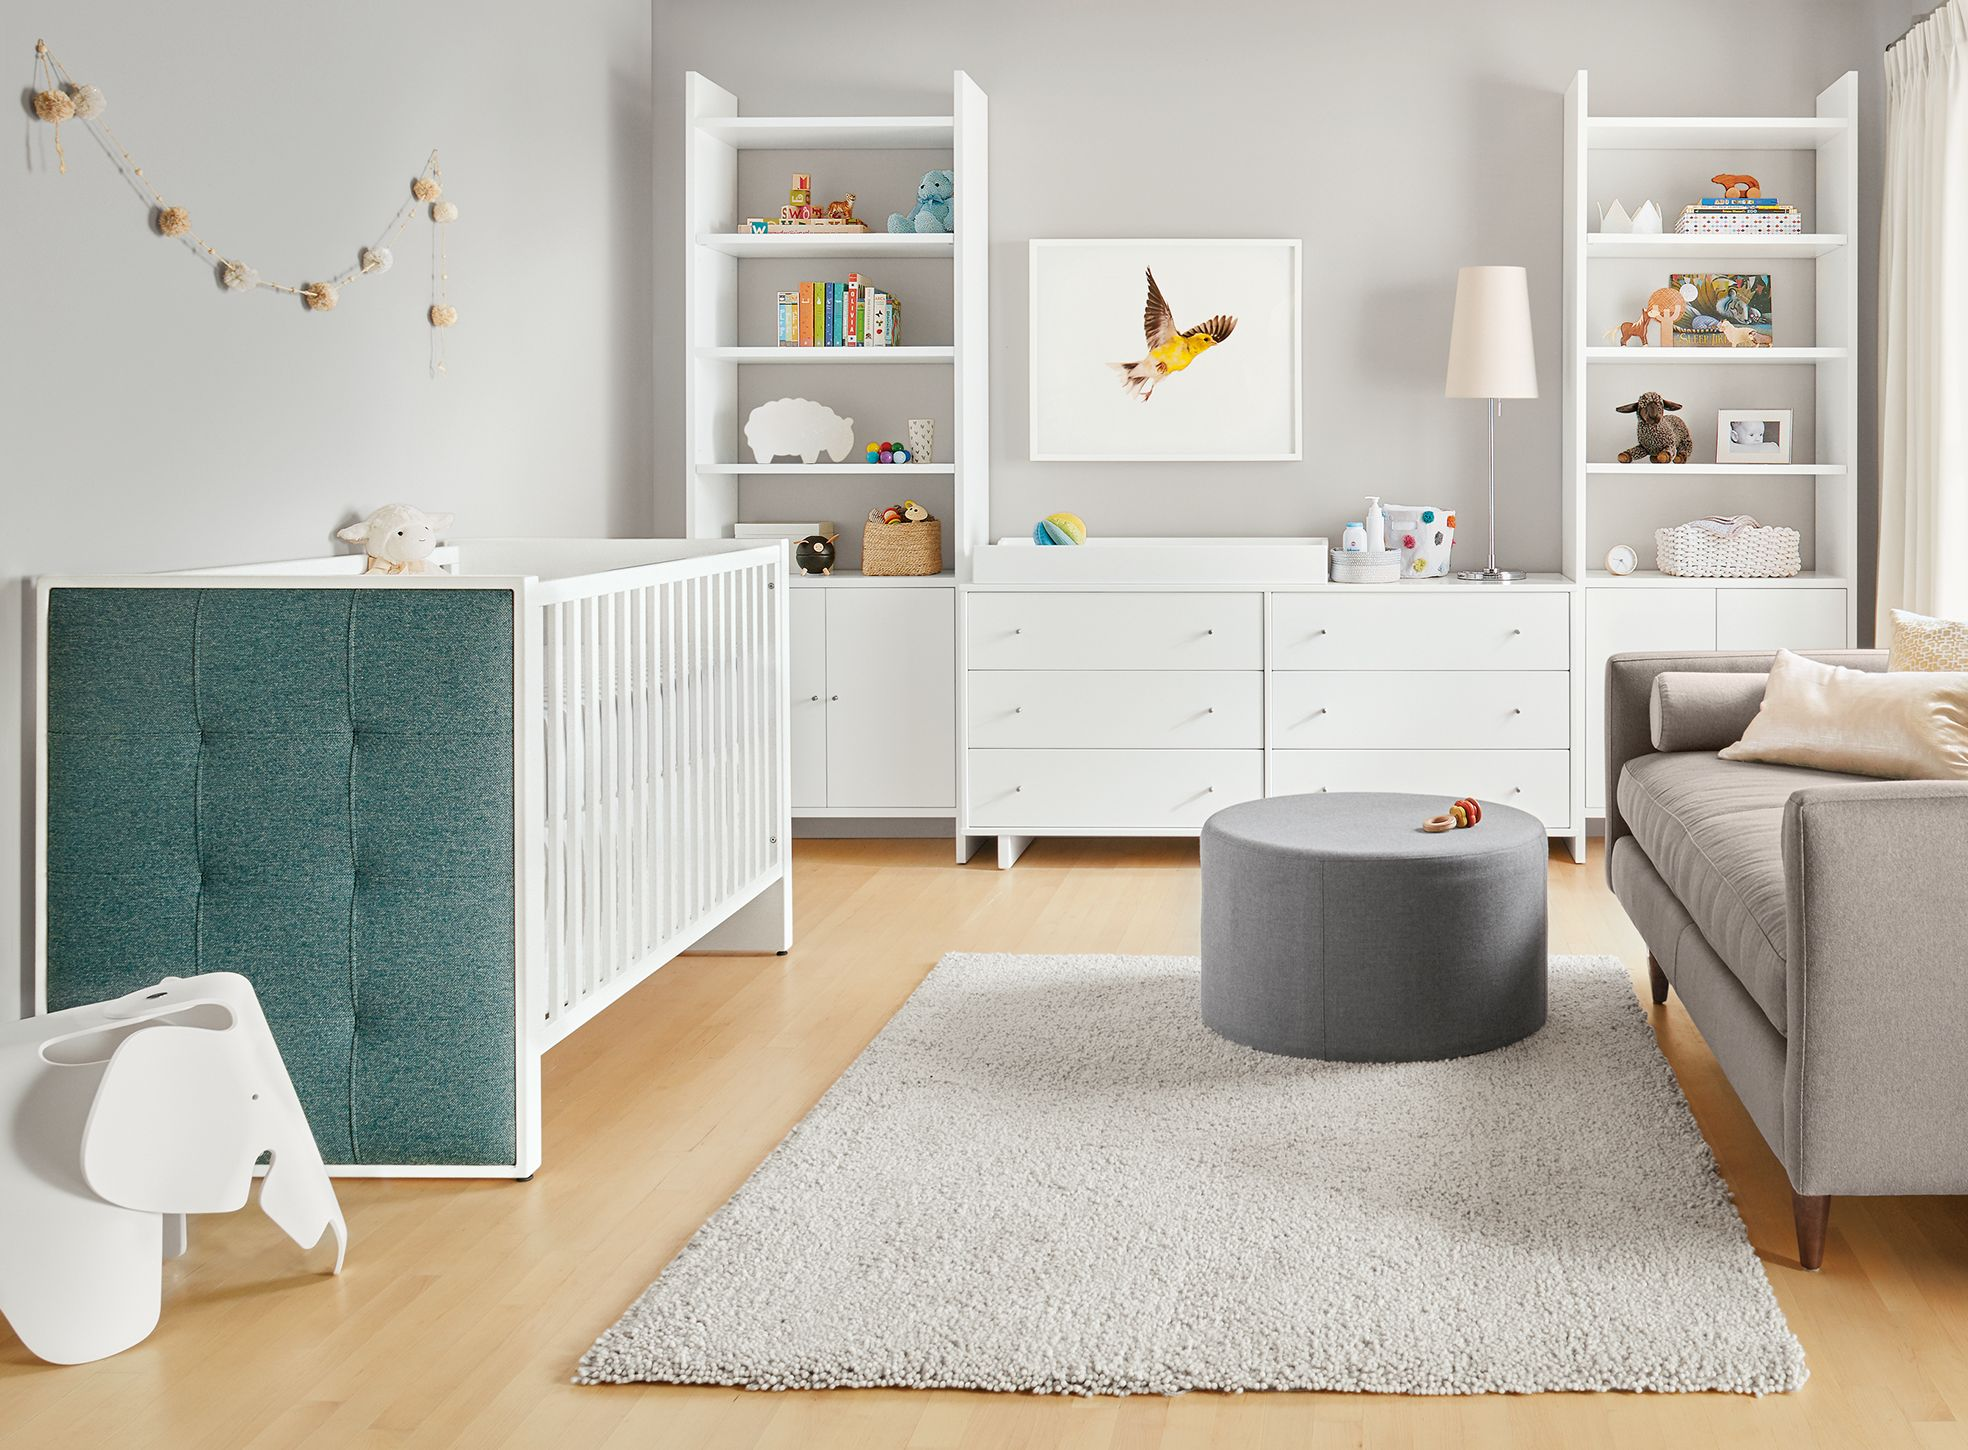 baby rooms ideas advice room board. Black Bedroom Furniture Sets. Home Design Ideas